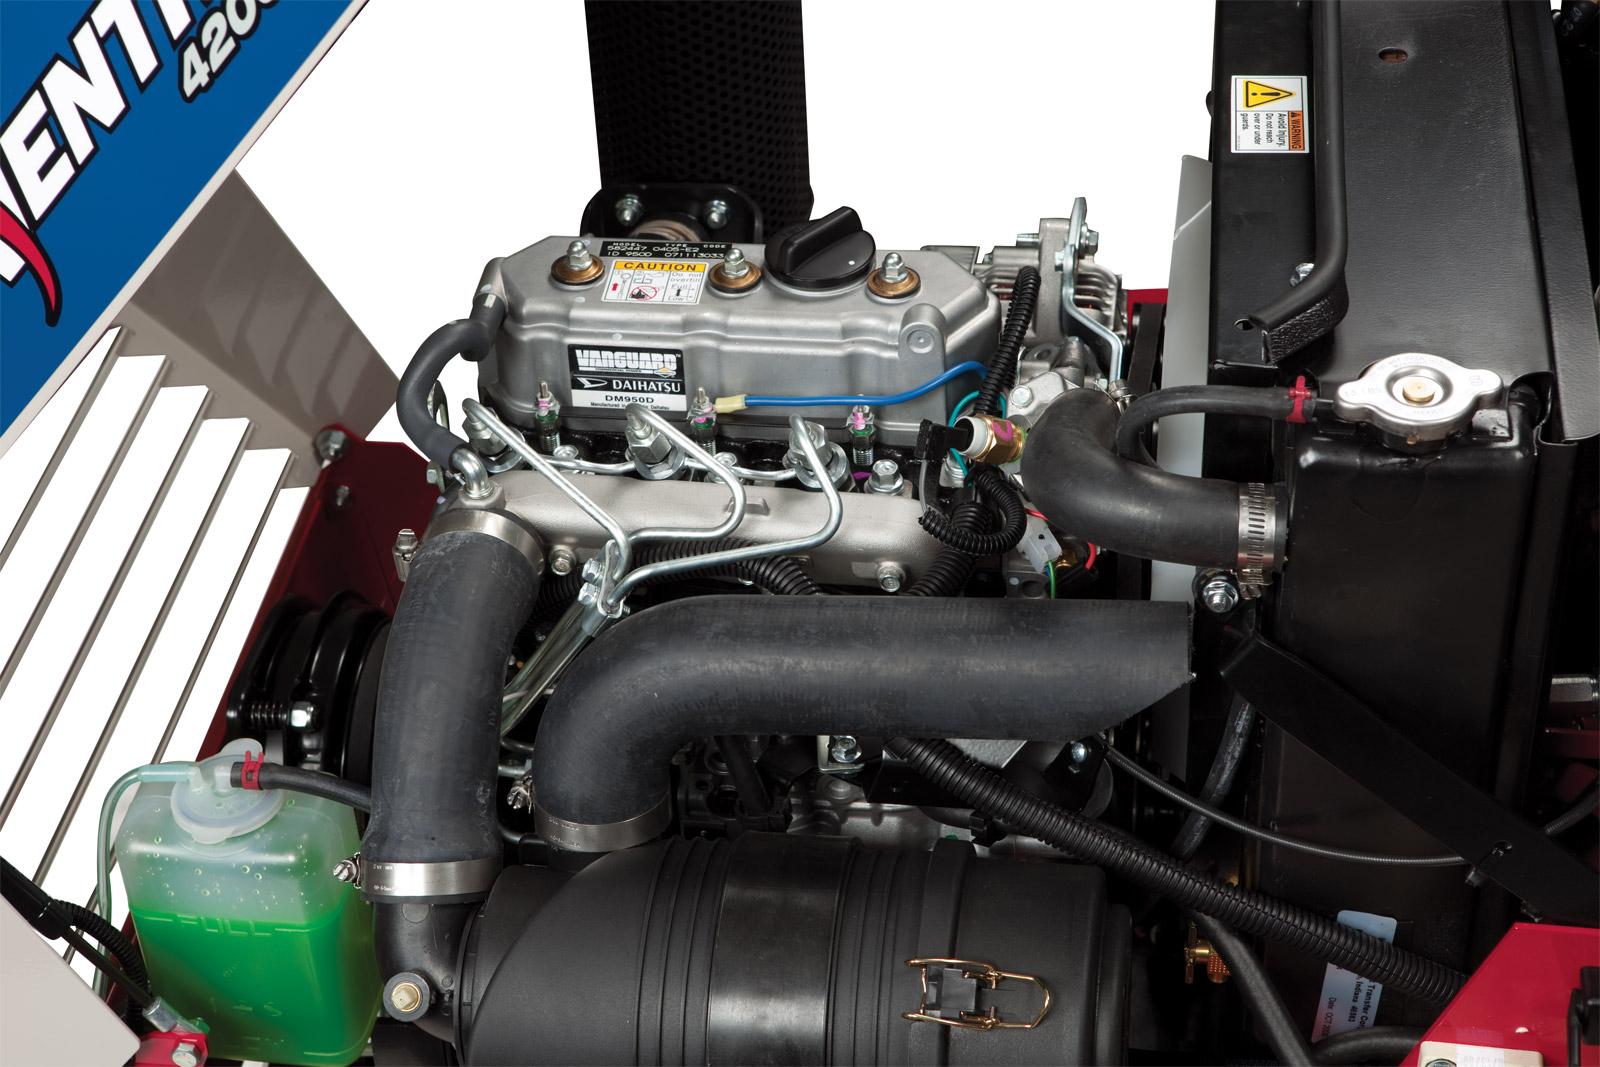 ventrac kt4200 4200 vxd rh ventrac com Daihatsu 3 Cylinder Diesel Engine Daihatsu Vanguard Engine Parts